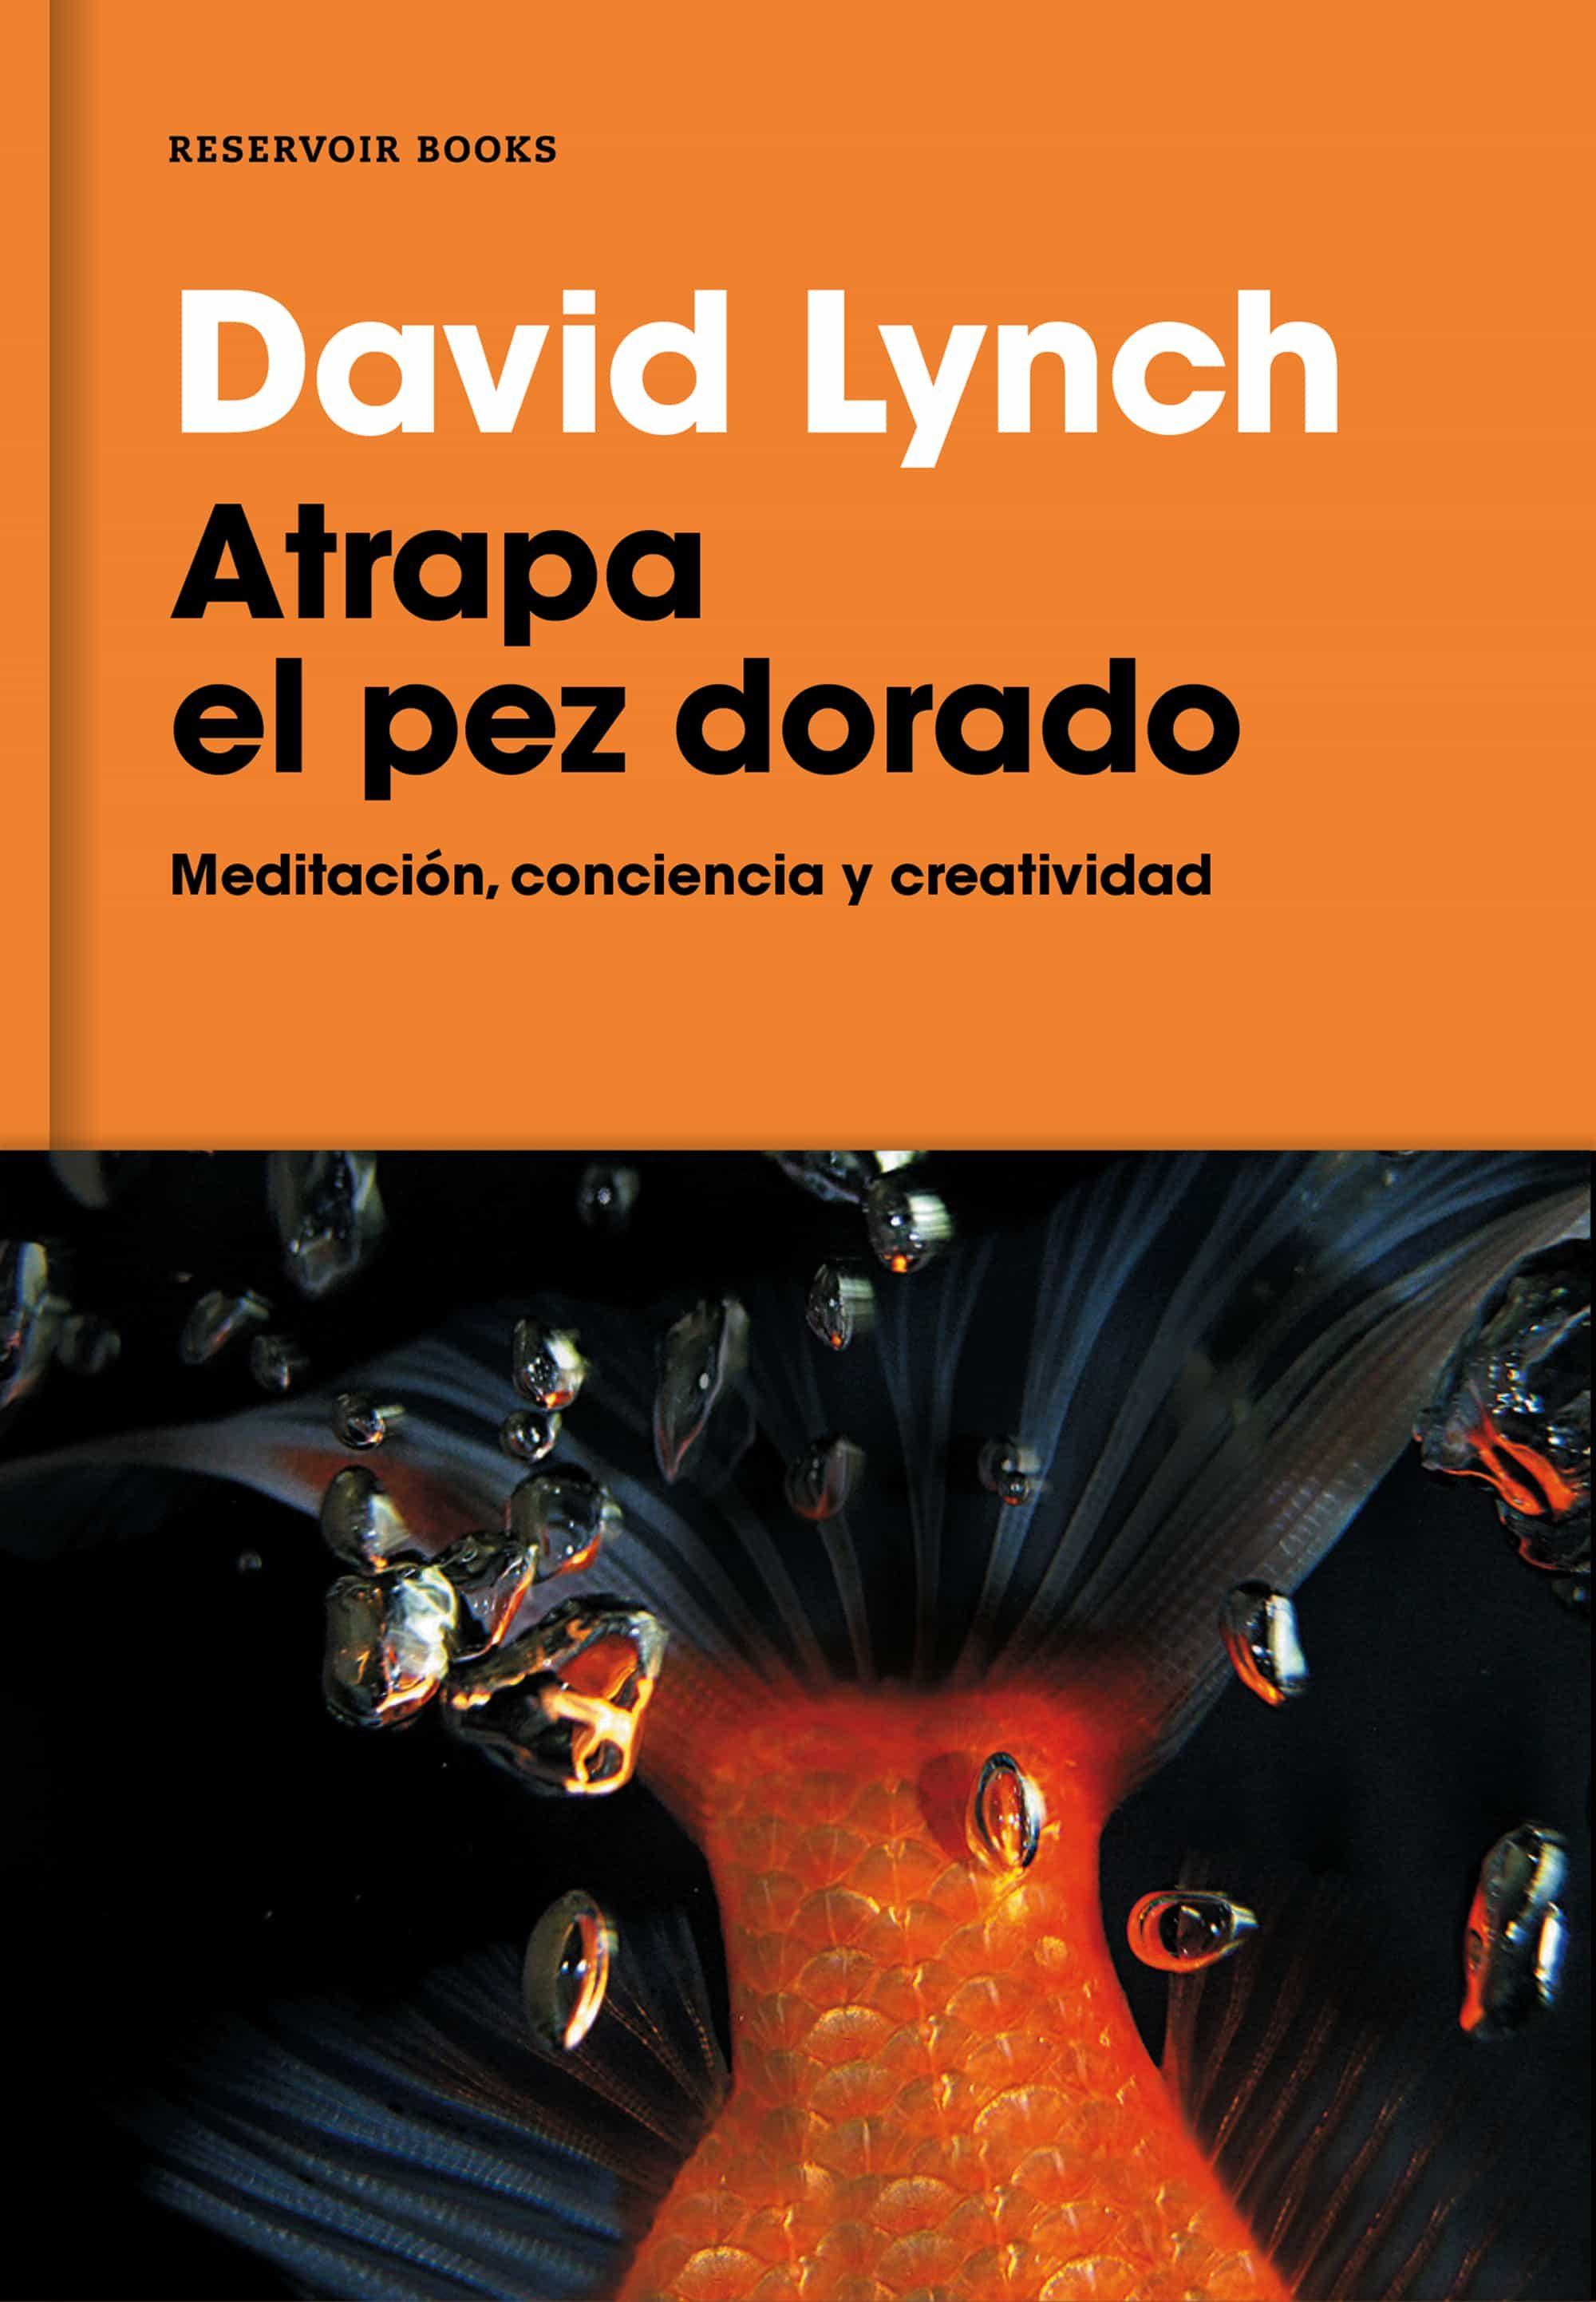 atrapa el pez dorado david lynch pdf